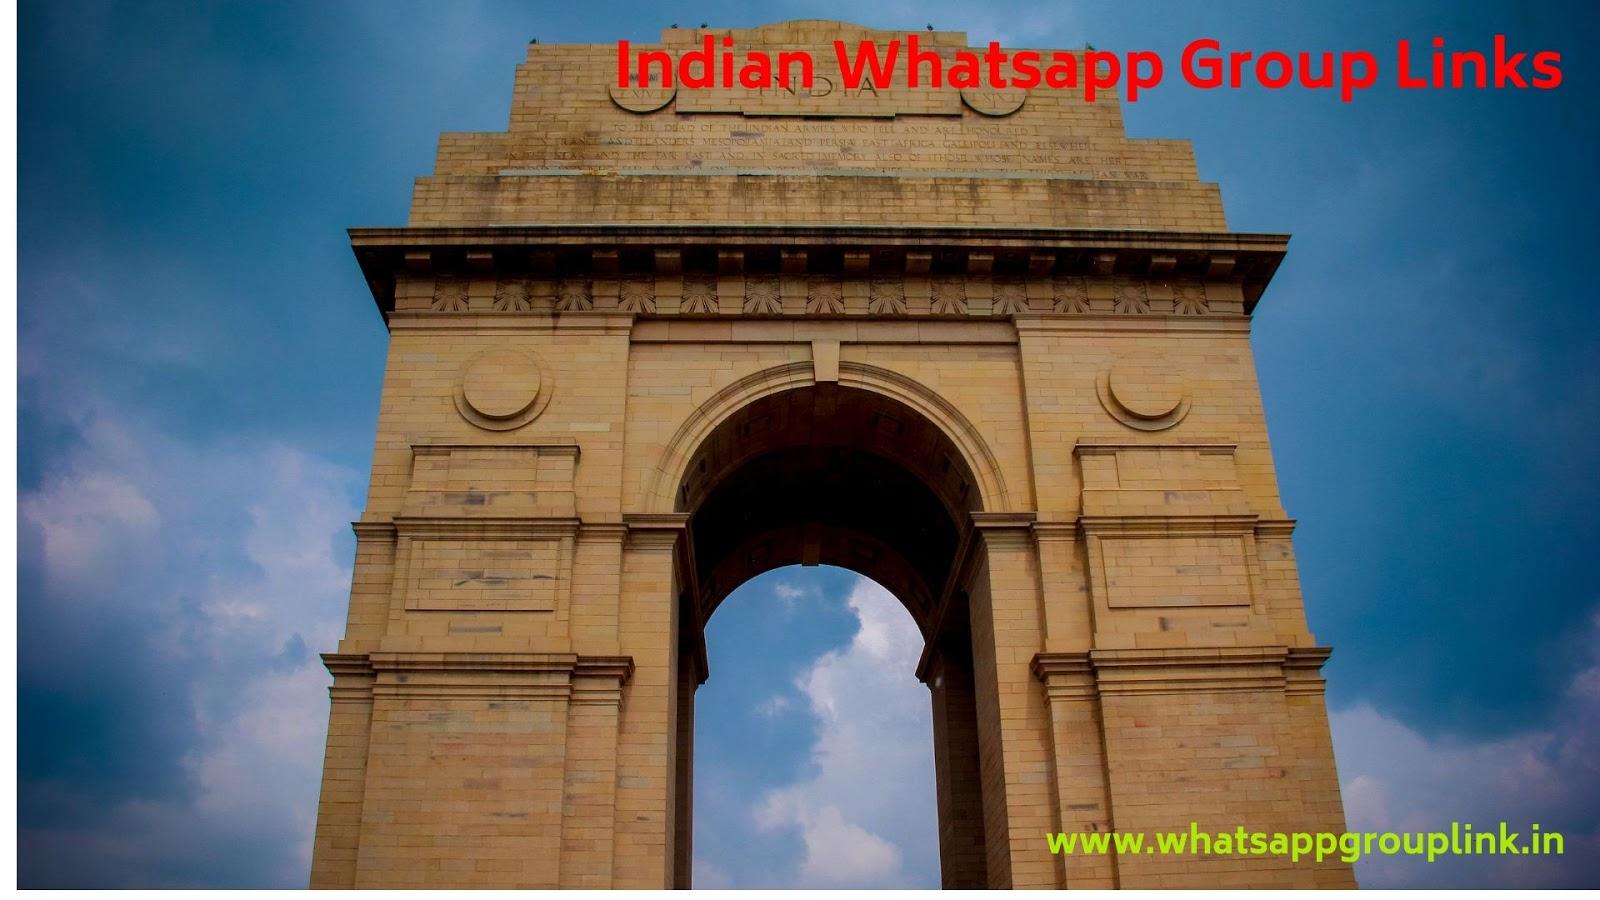 Whatsapp Group Link: Indian Whatsapp Group Links